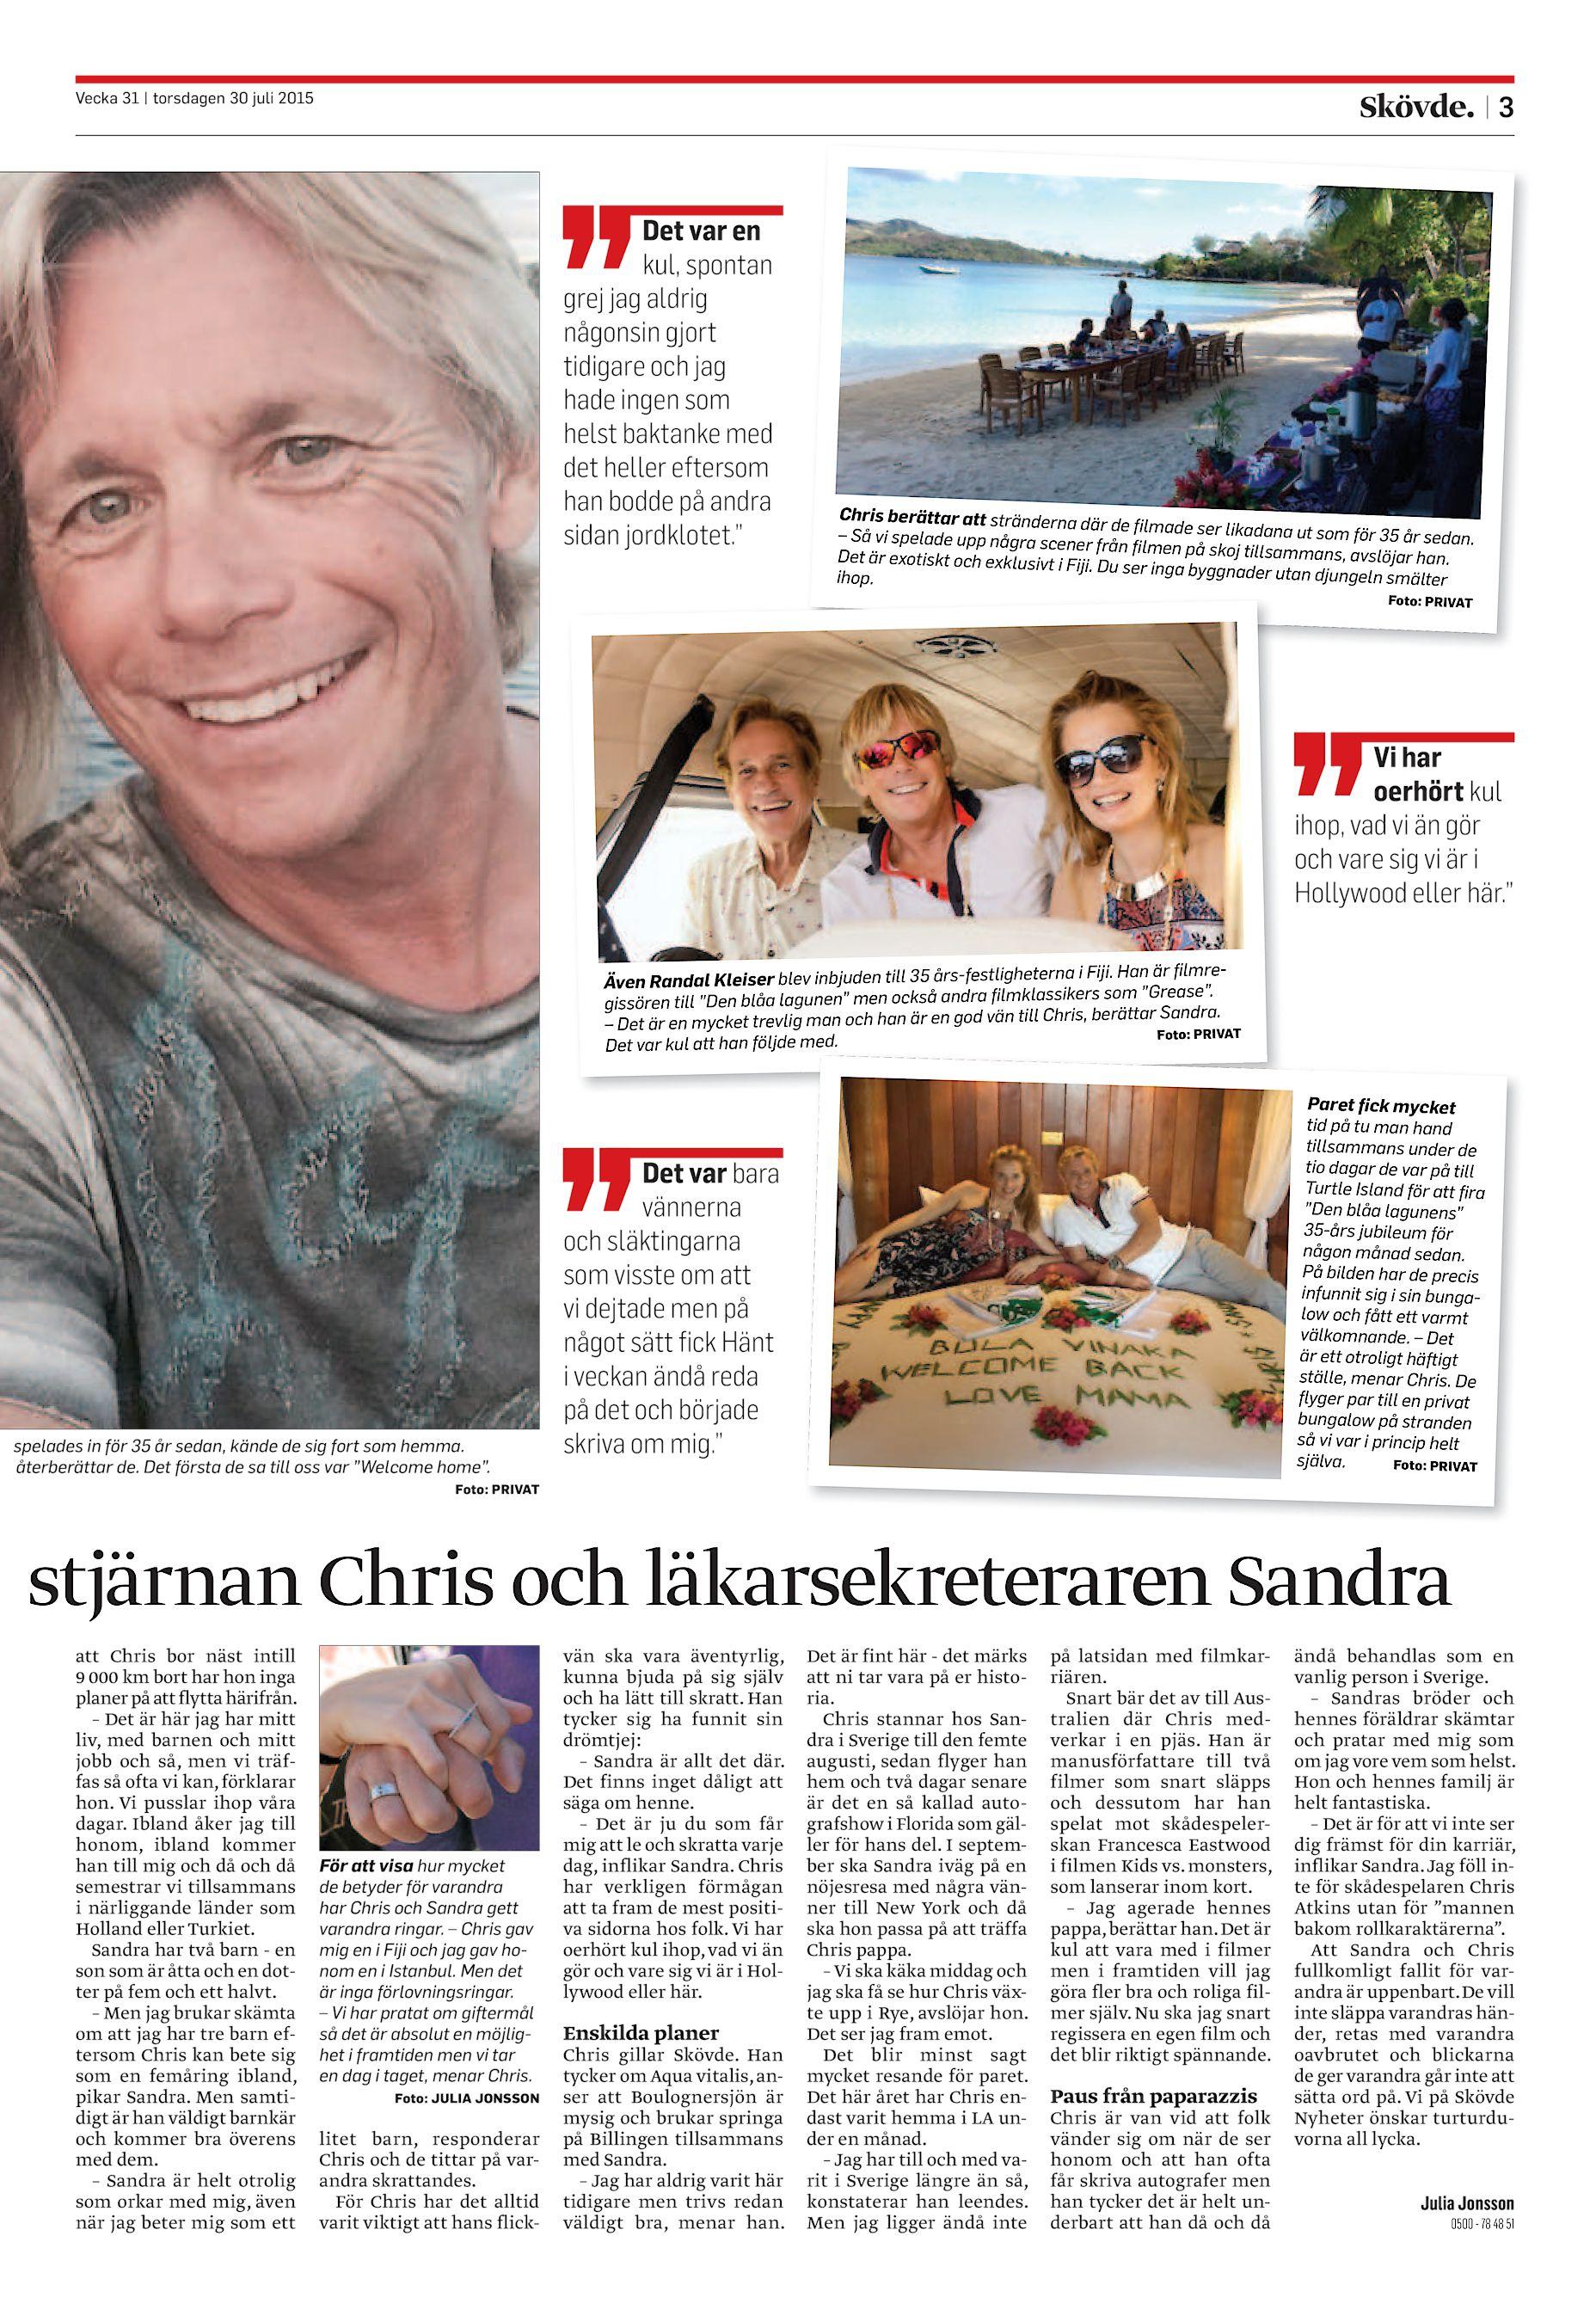 Skövde Nyheter SN-20150730 (endast text) 0c6be2ae106a7